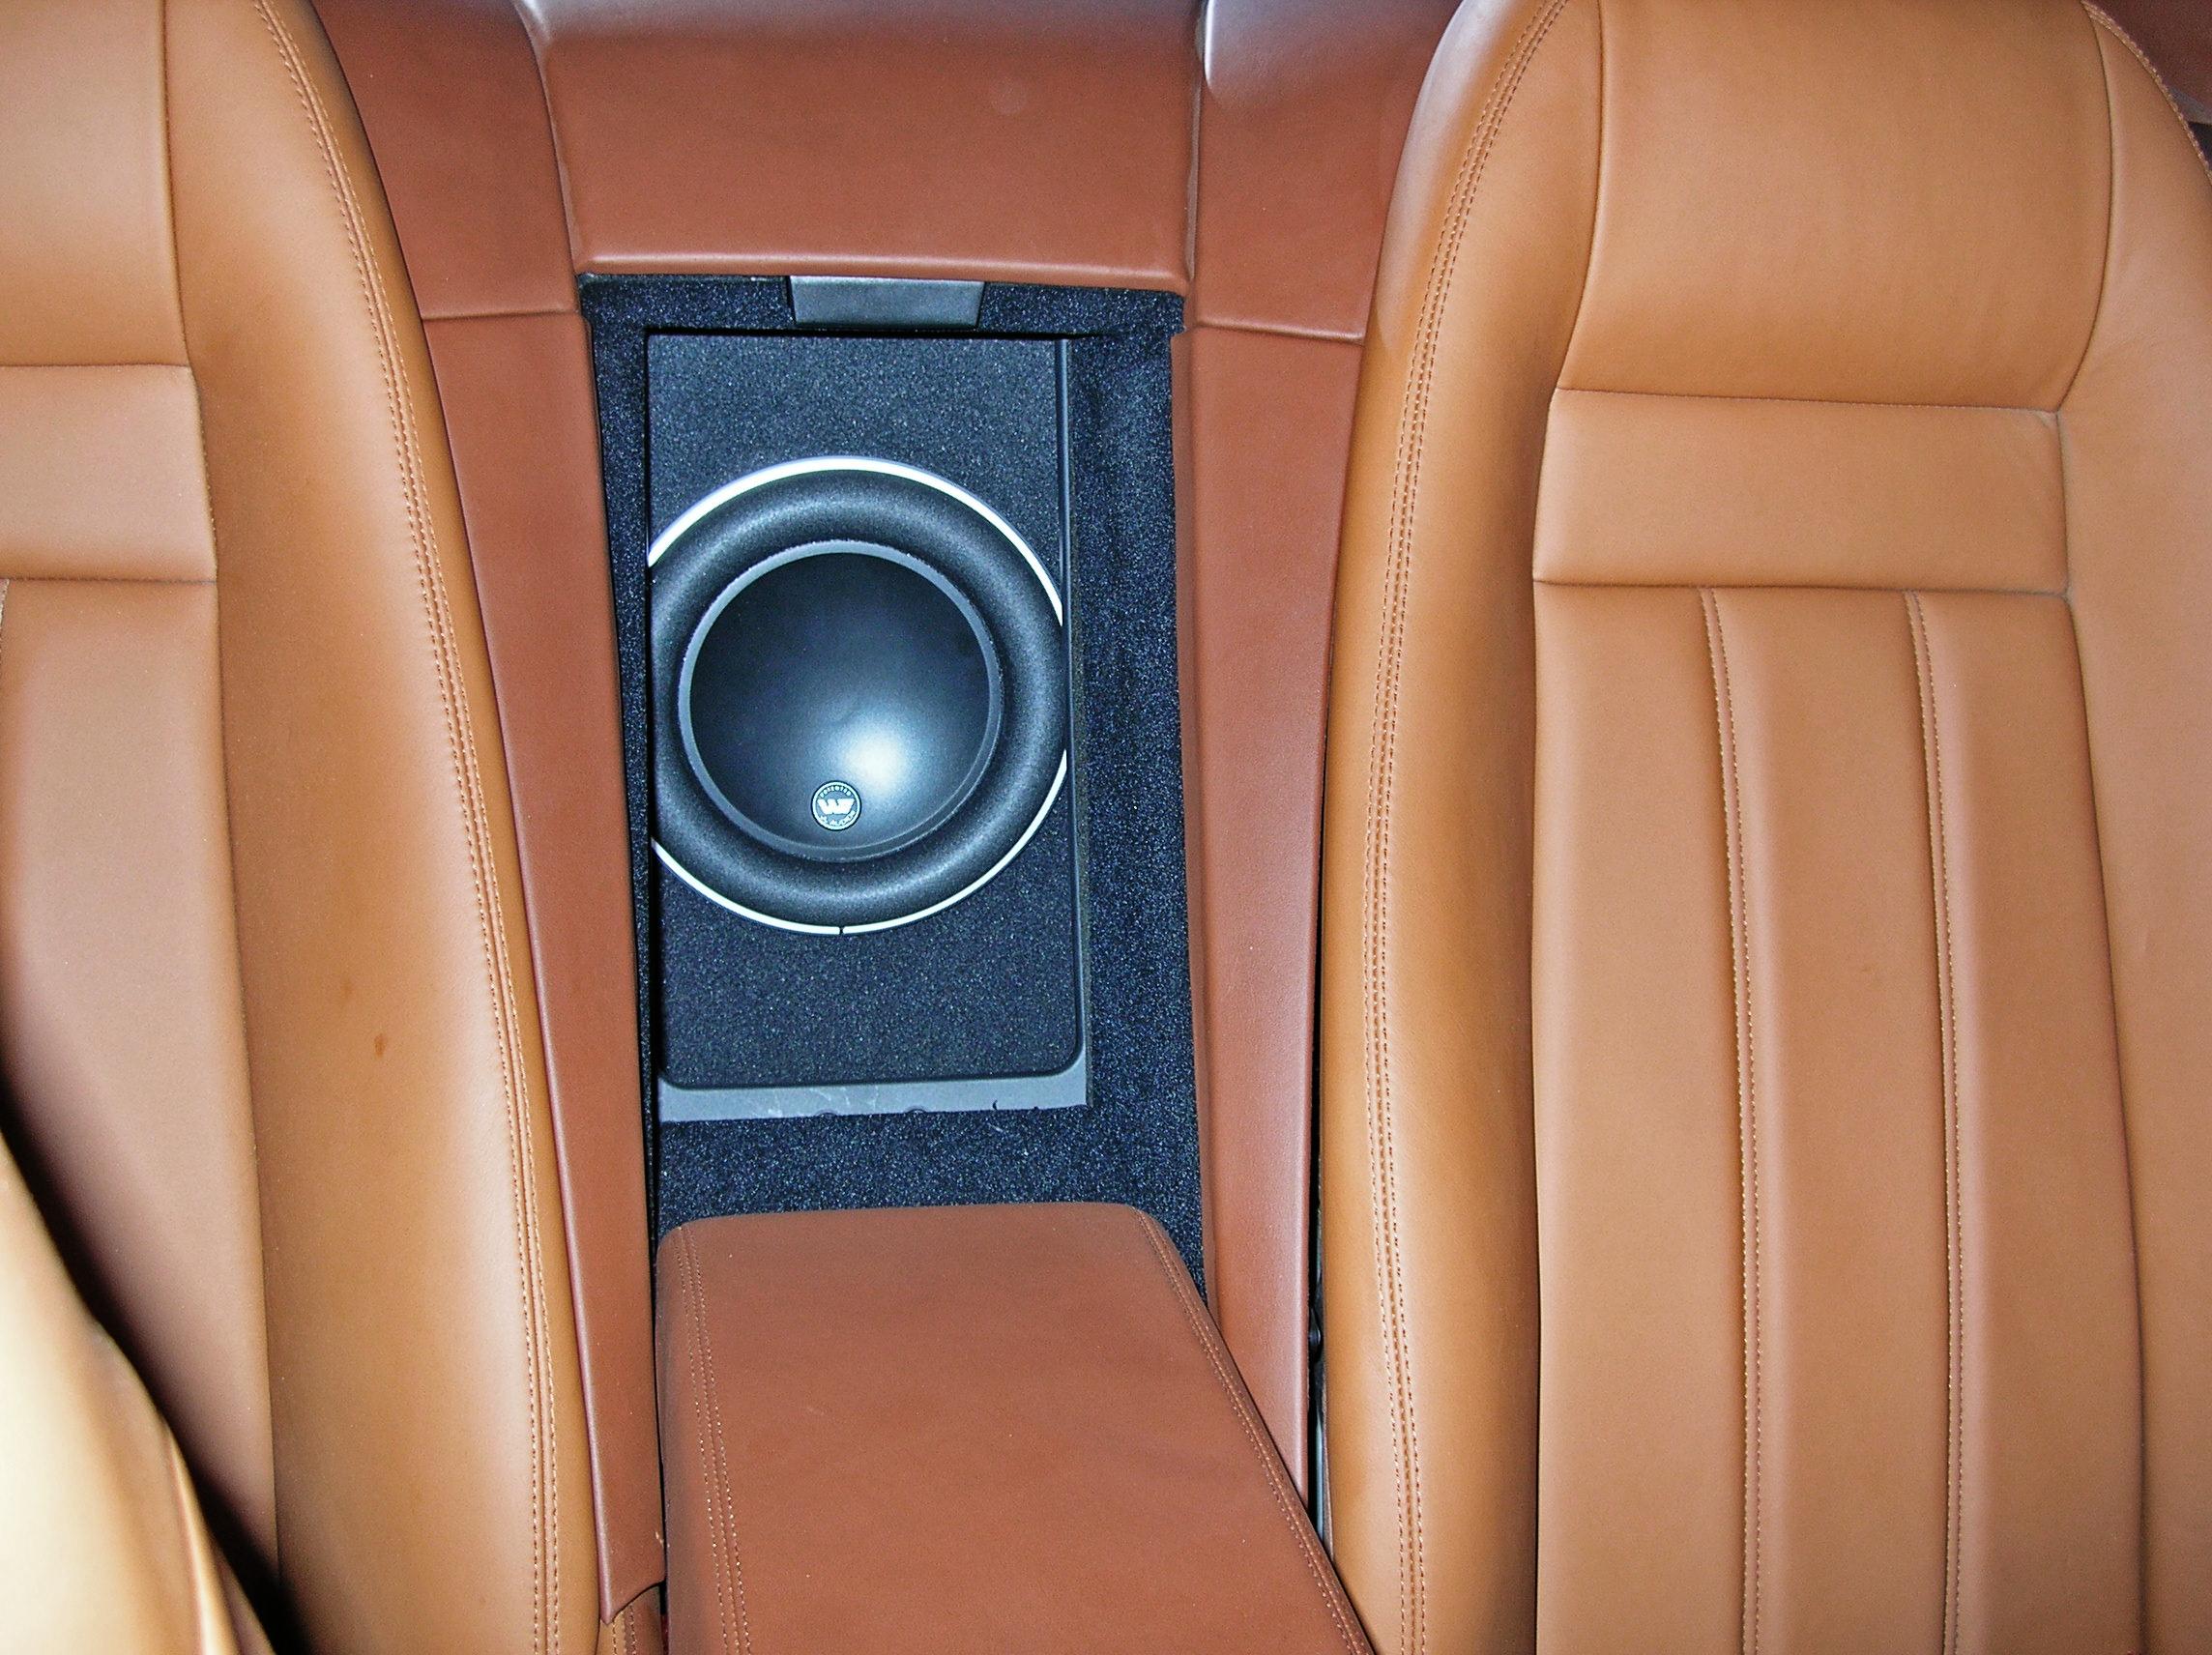 Electronics Gt Vehicle Electronics Gps Gt Car Audio Gt Car Subwoofers